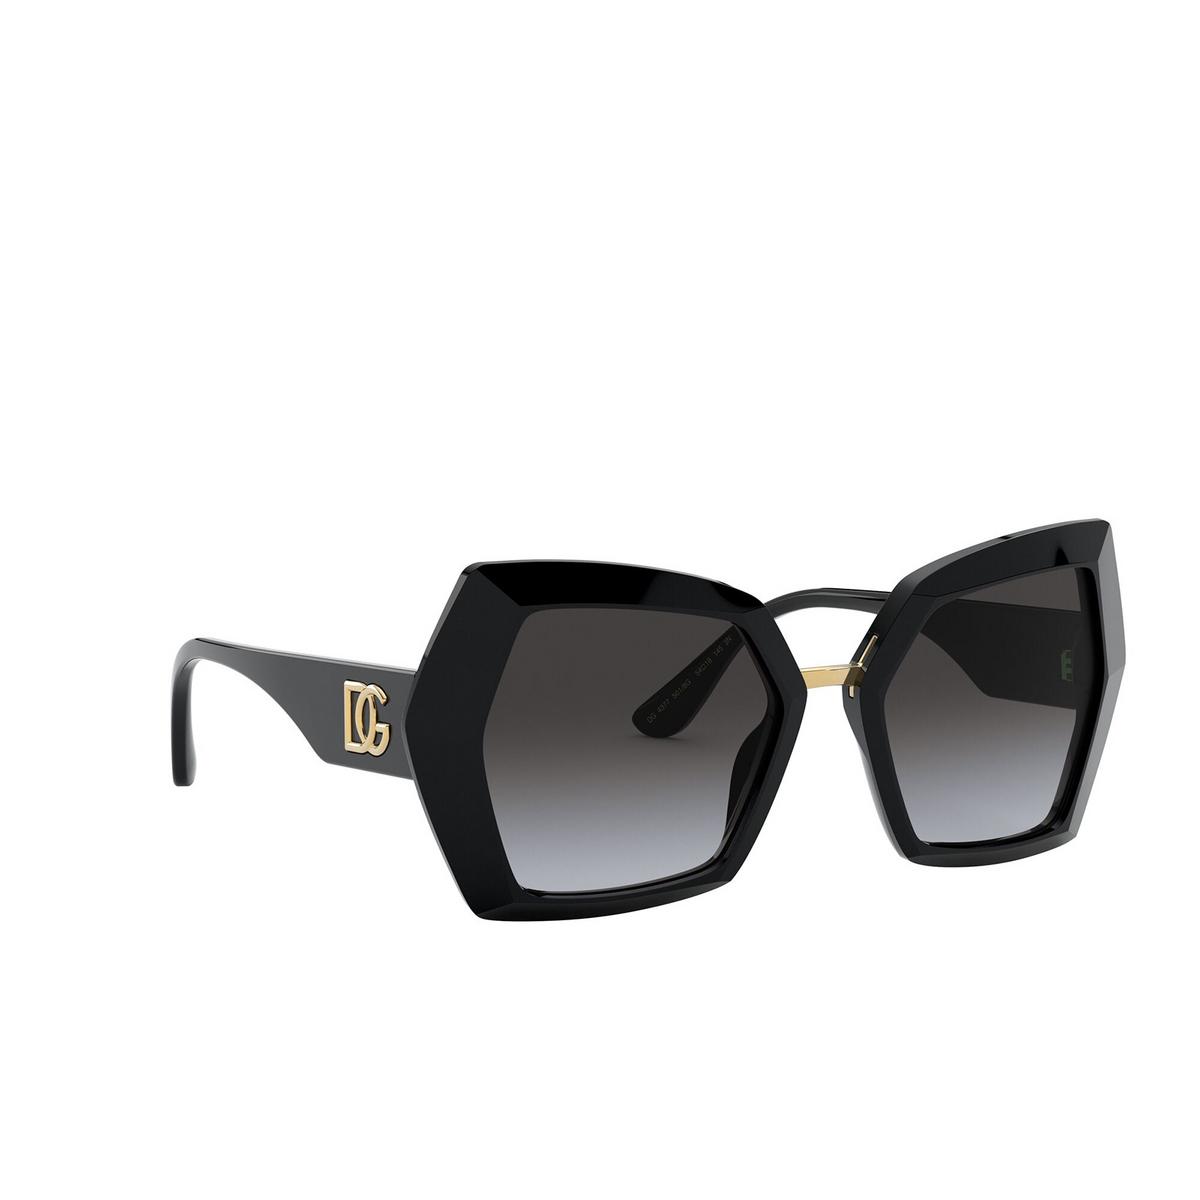 Dolce & Gabbana® Butterfly Sunglasses: DG4377 color Black 501/8G - three-quarters view.